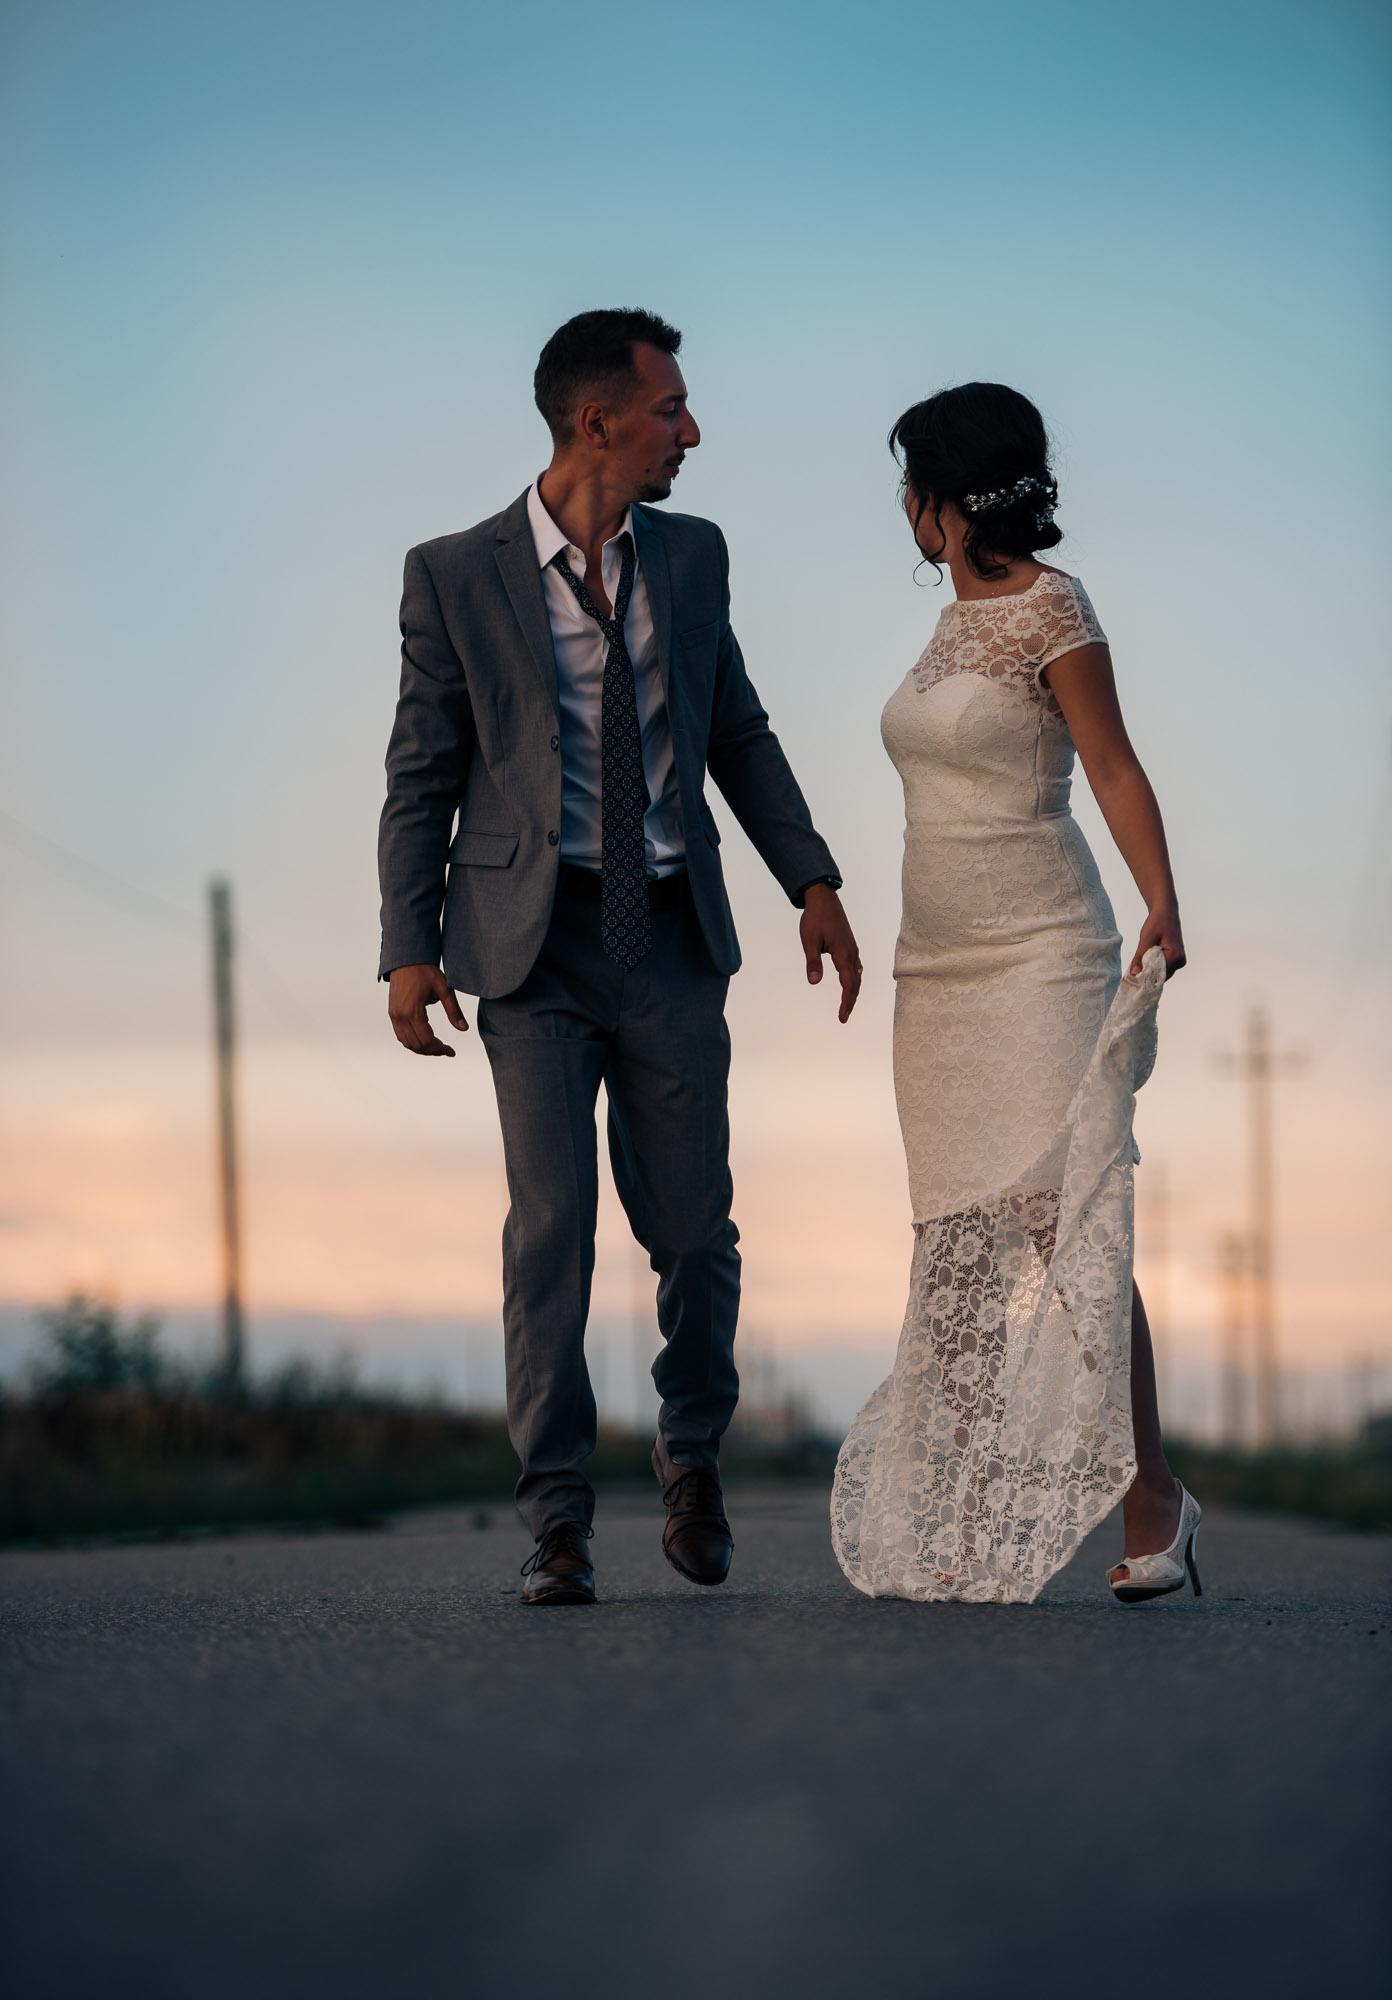 Eheleute laufen gemeinsam den Weg entlang